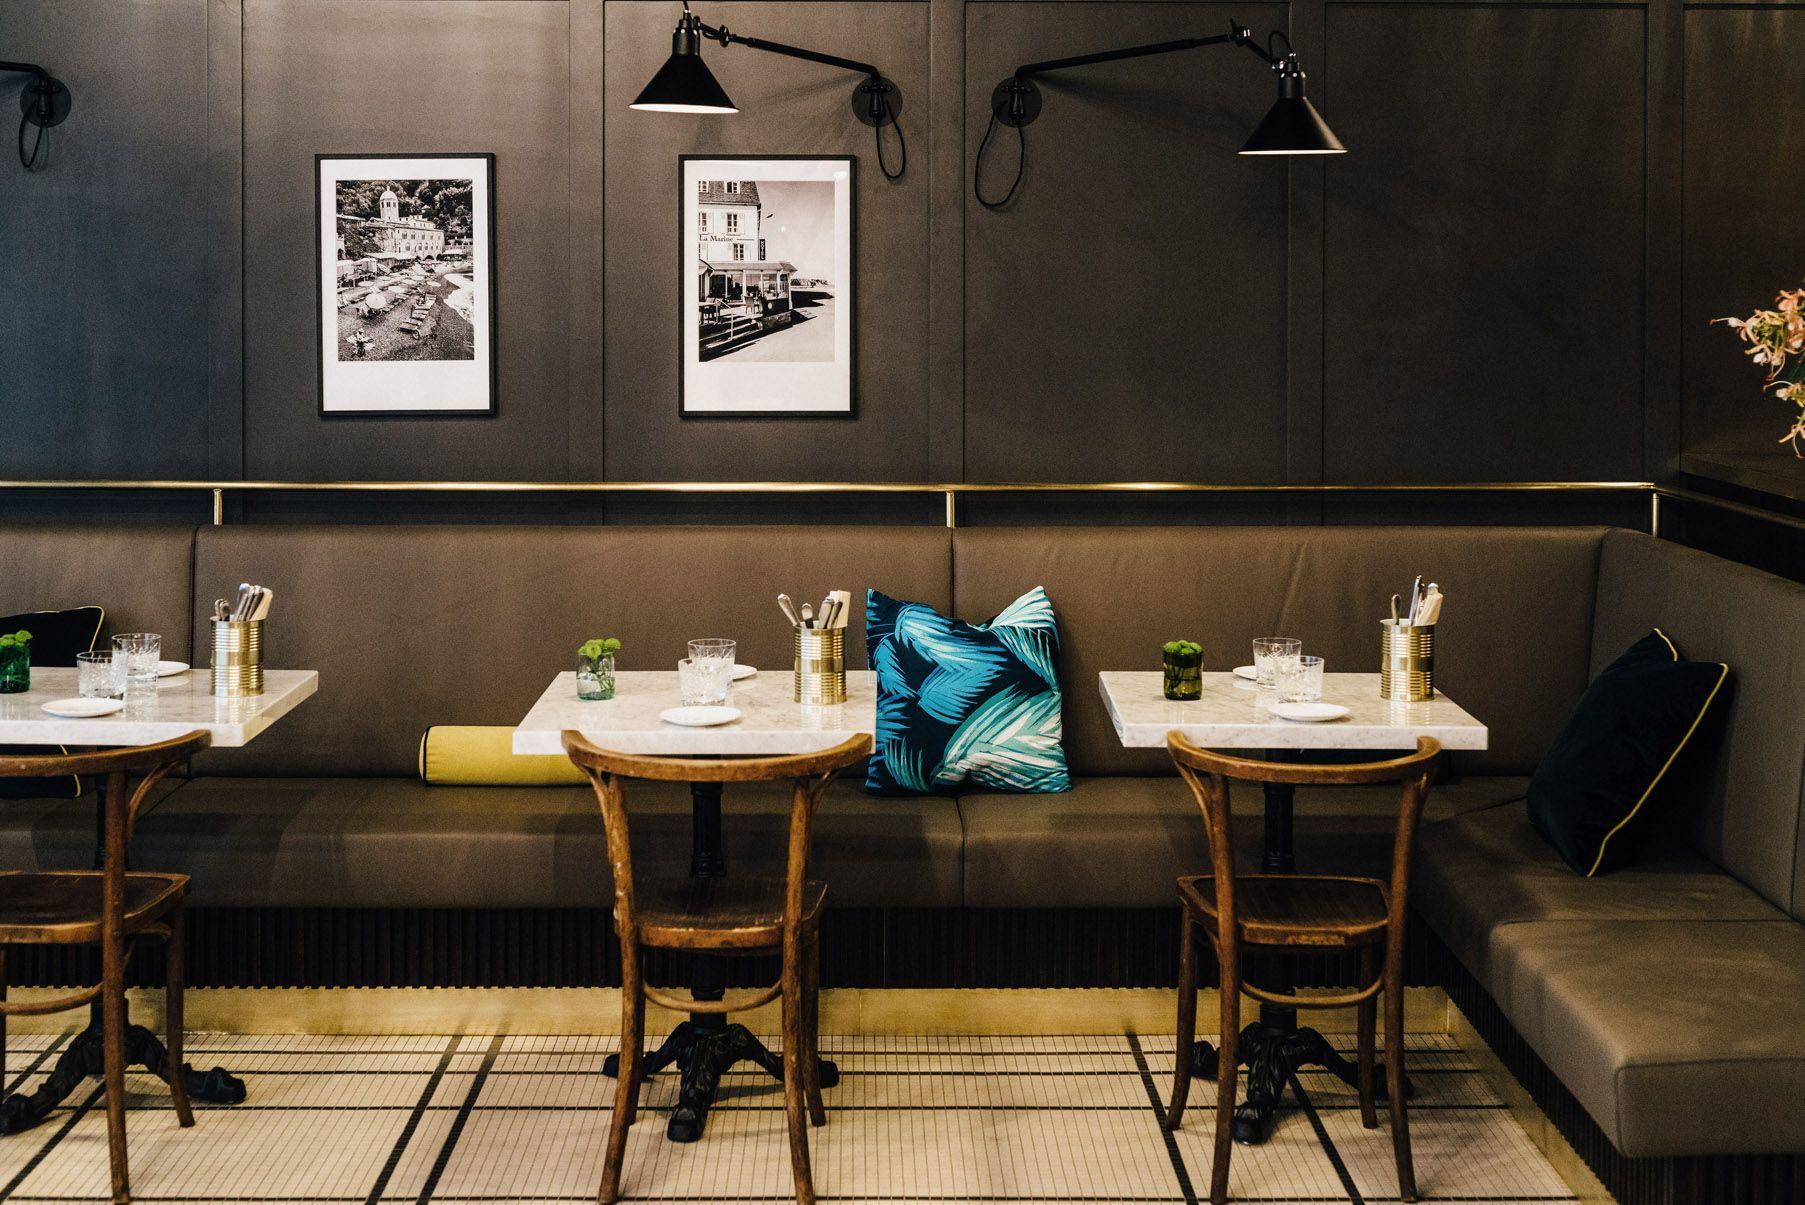 tertianum - restaurant - brasserie - timber - panelling - dark